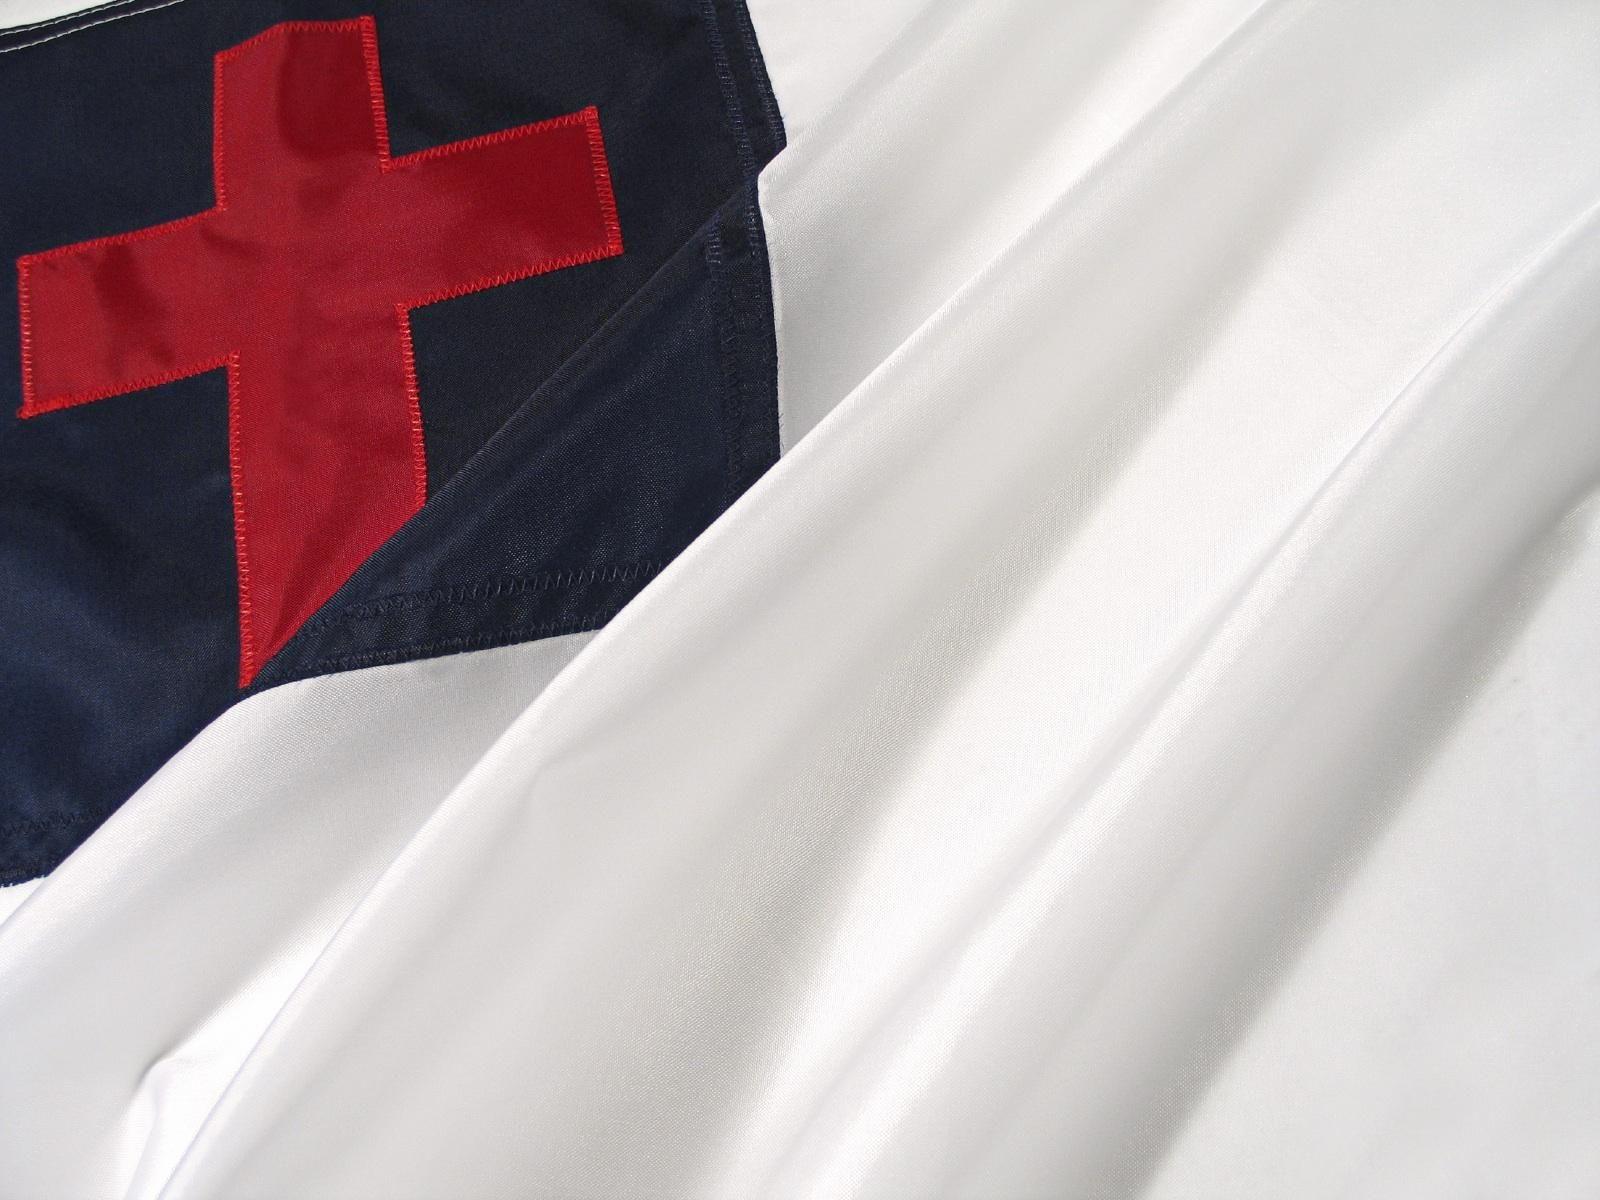 Christian Flag Christian Flag Pledge To The Christian Flag Christian